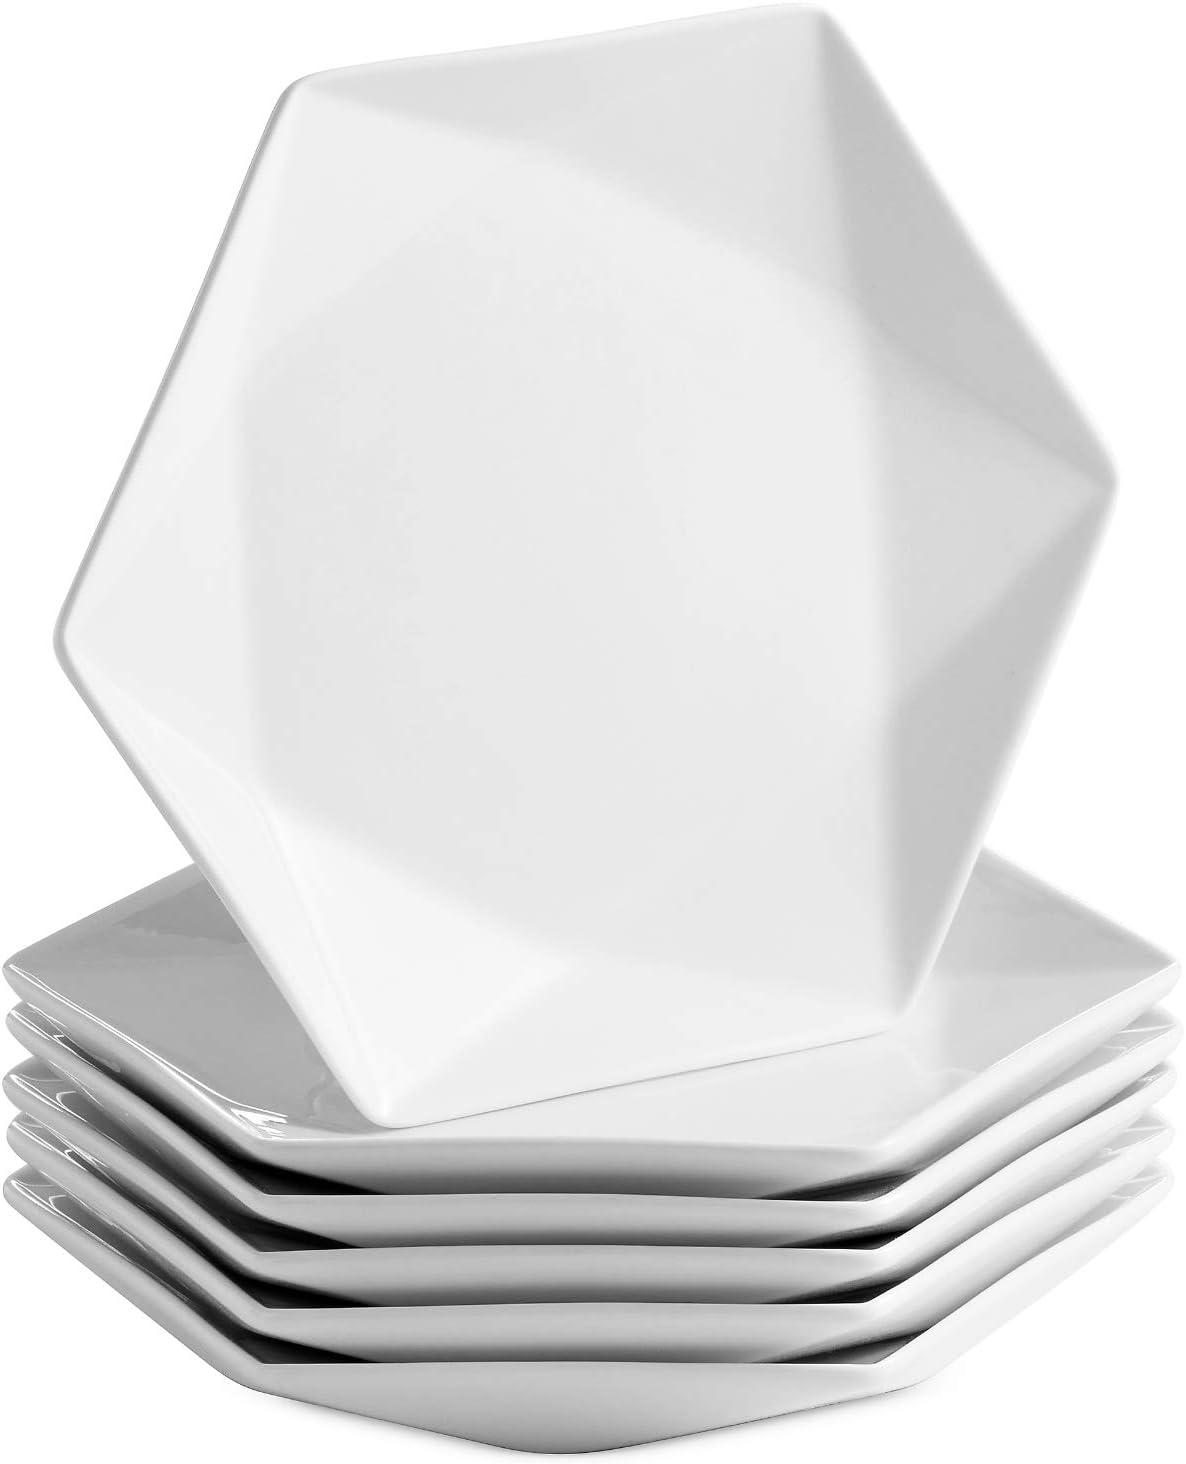 Mitbak 8 Inch Porcelain Salad Plates | Set of 6 Elegant Diamond Shaped Natural White Dinnerware Set For Dinner, Holidays, Restaurant, Salad, Cheese, Dessert | White Dishes Make An Excellent Gift Idea